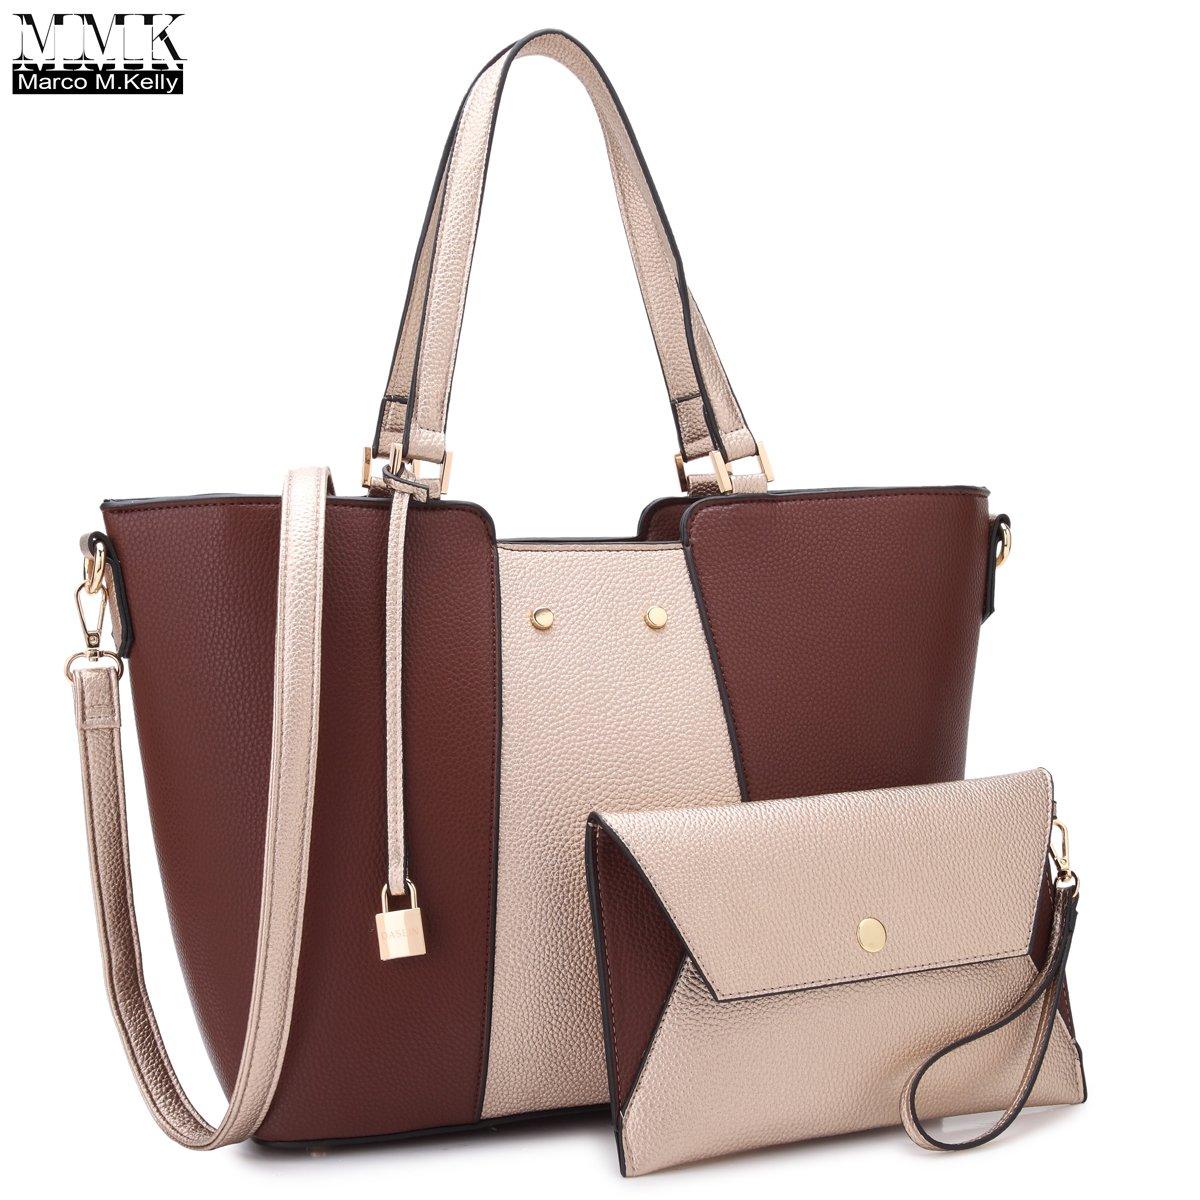 MMK collection Fashion Women Purses and Handbags